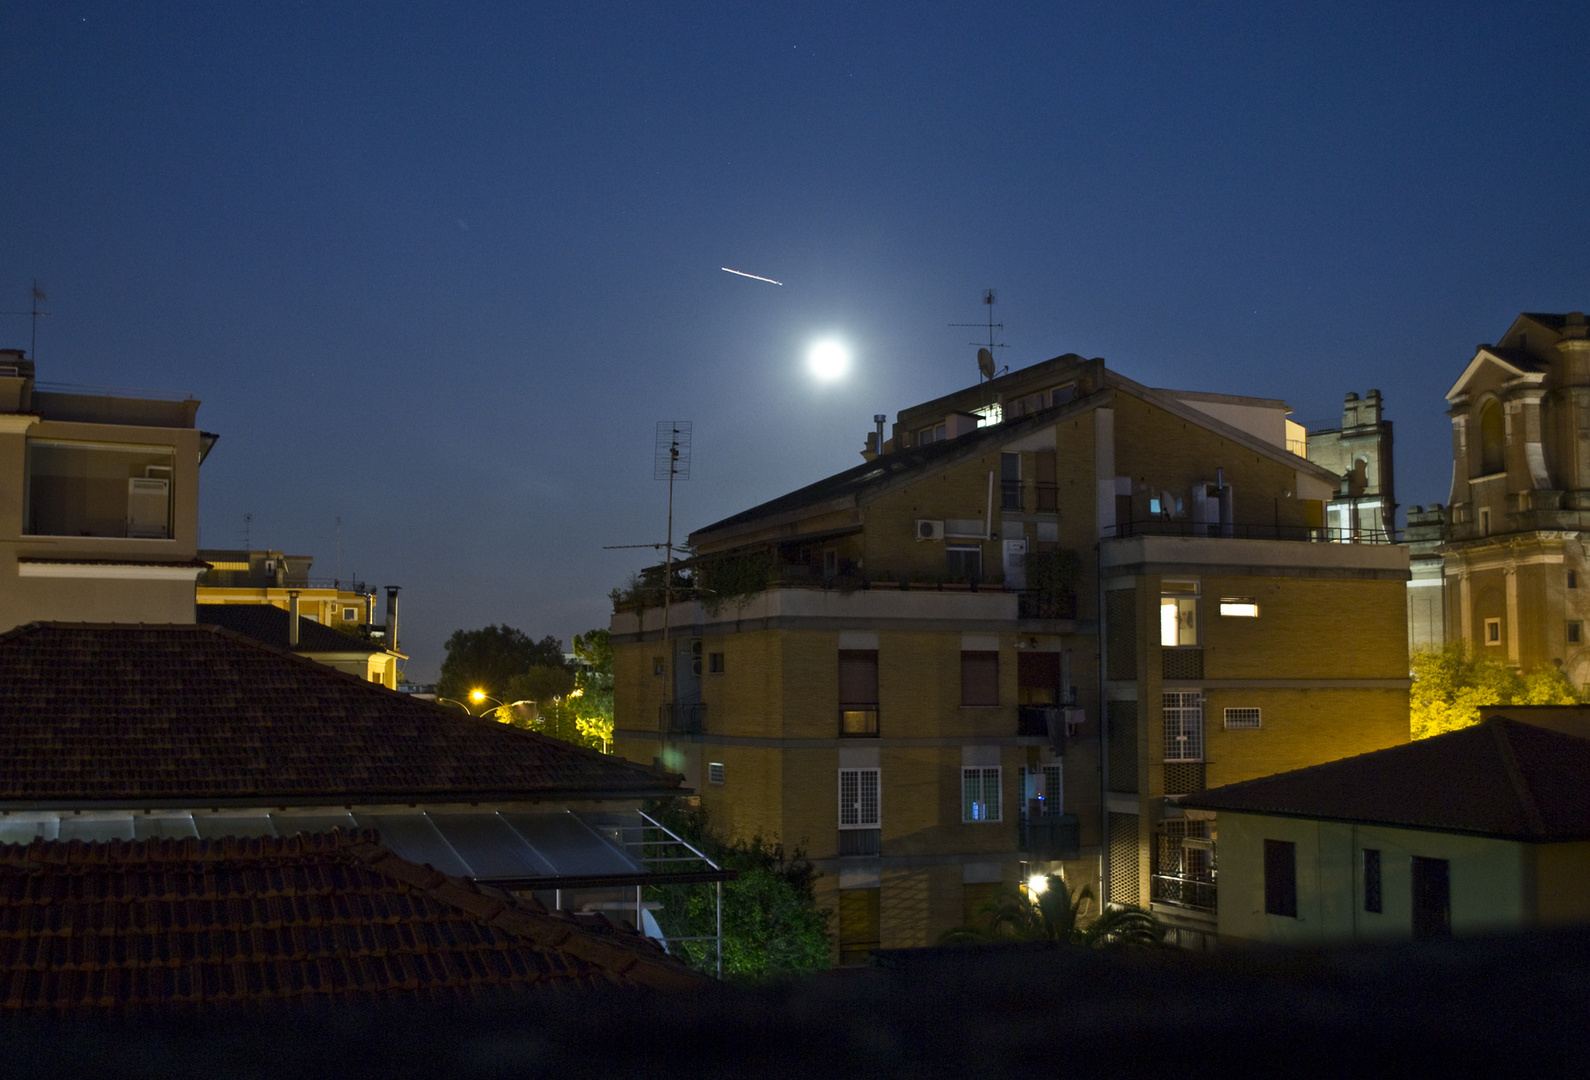 My Moon (one)